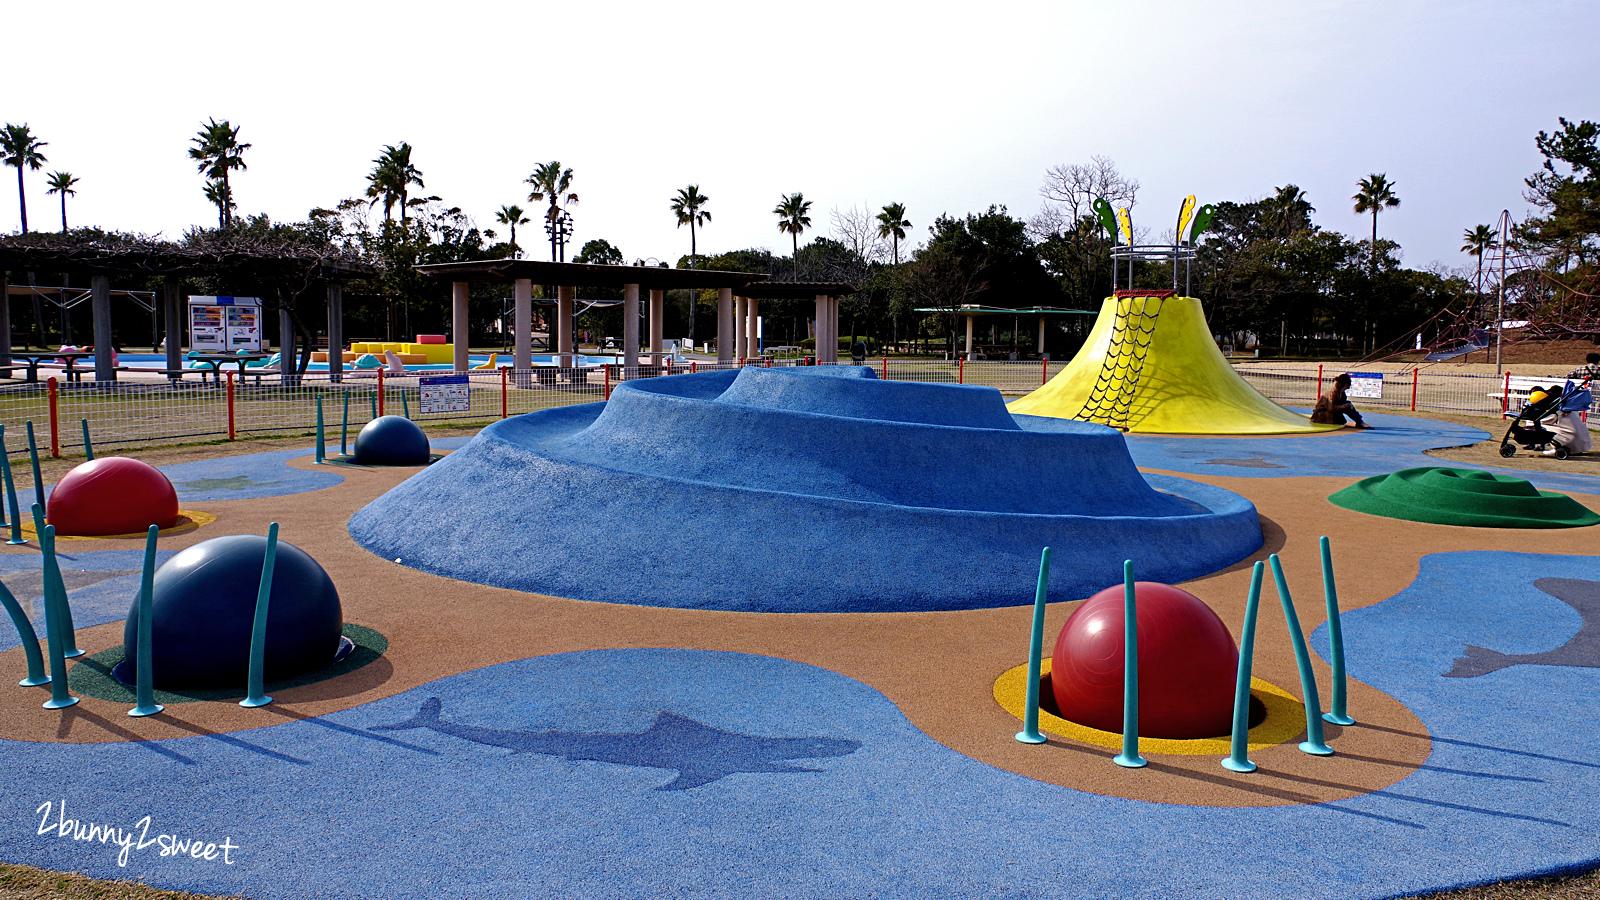 2019-0305-海の中道海浜公園-02.jpg